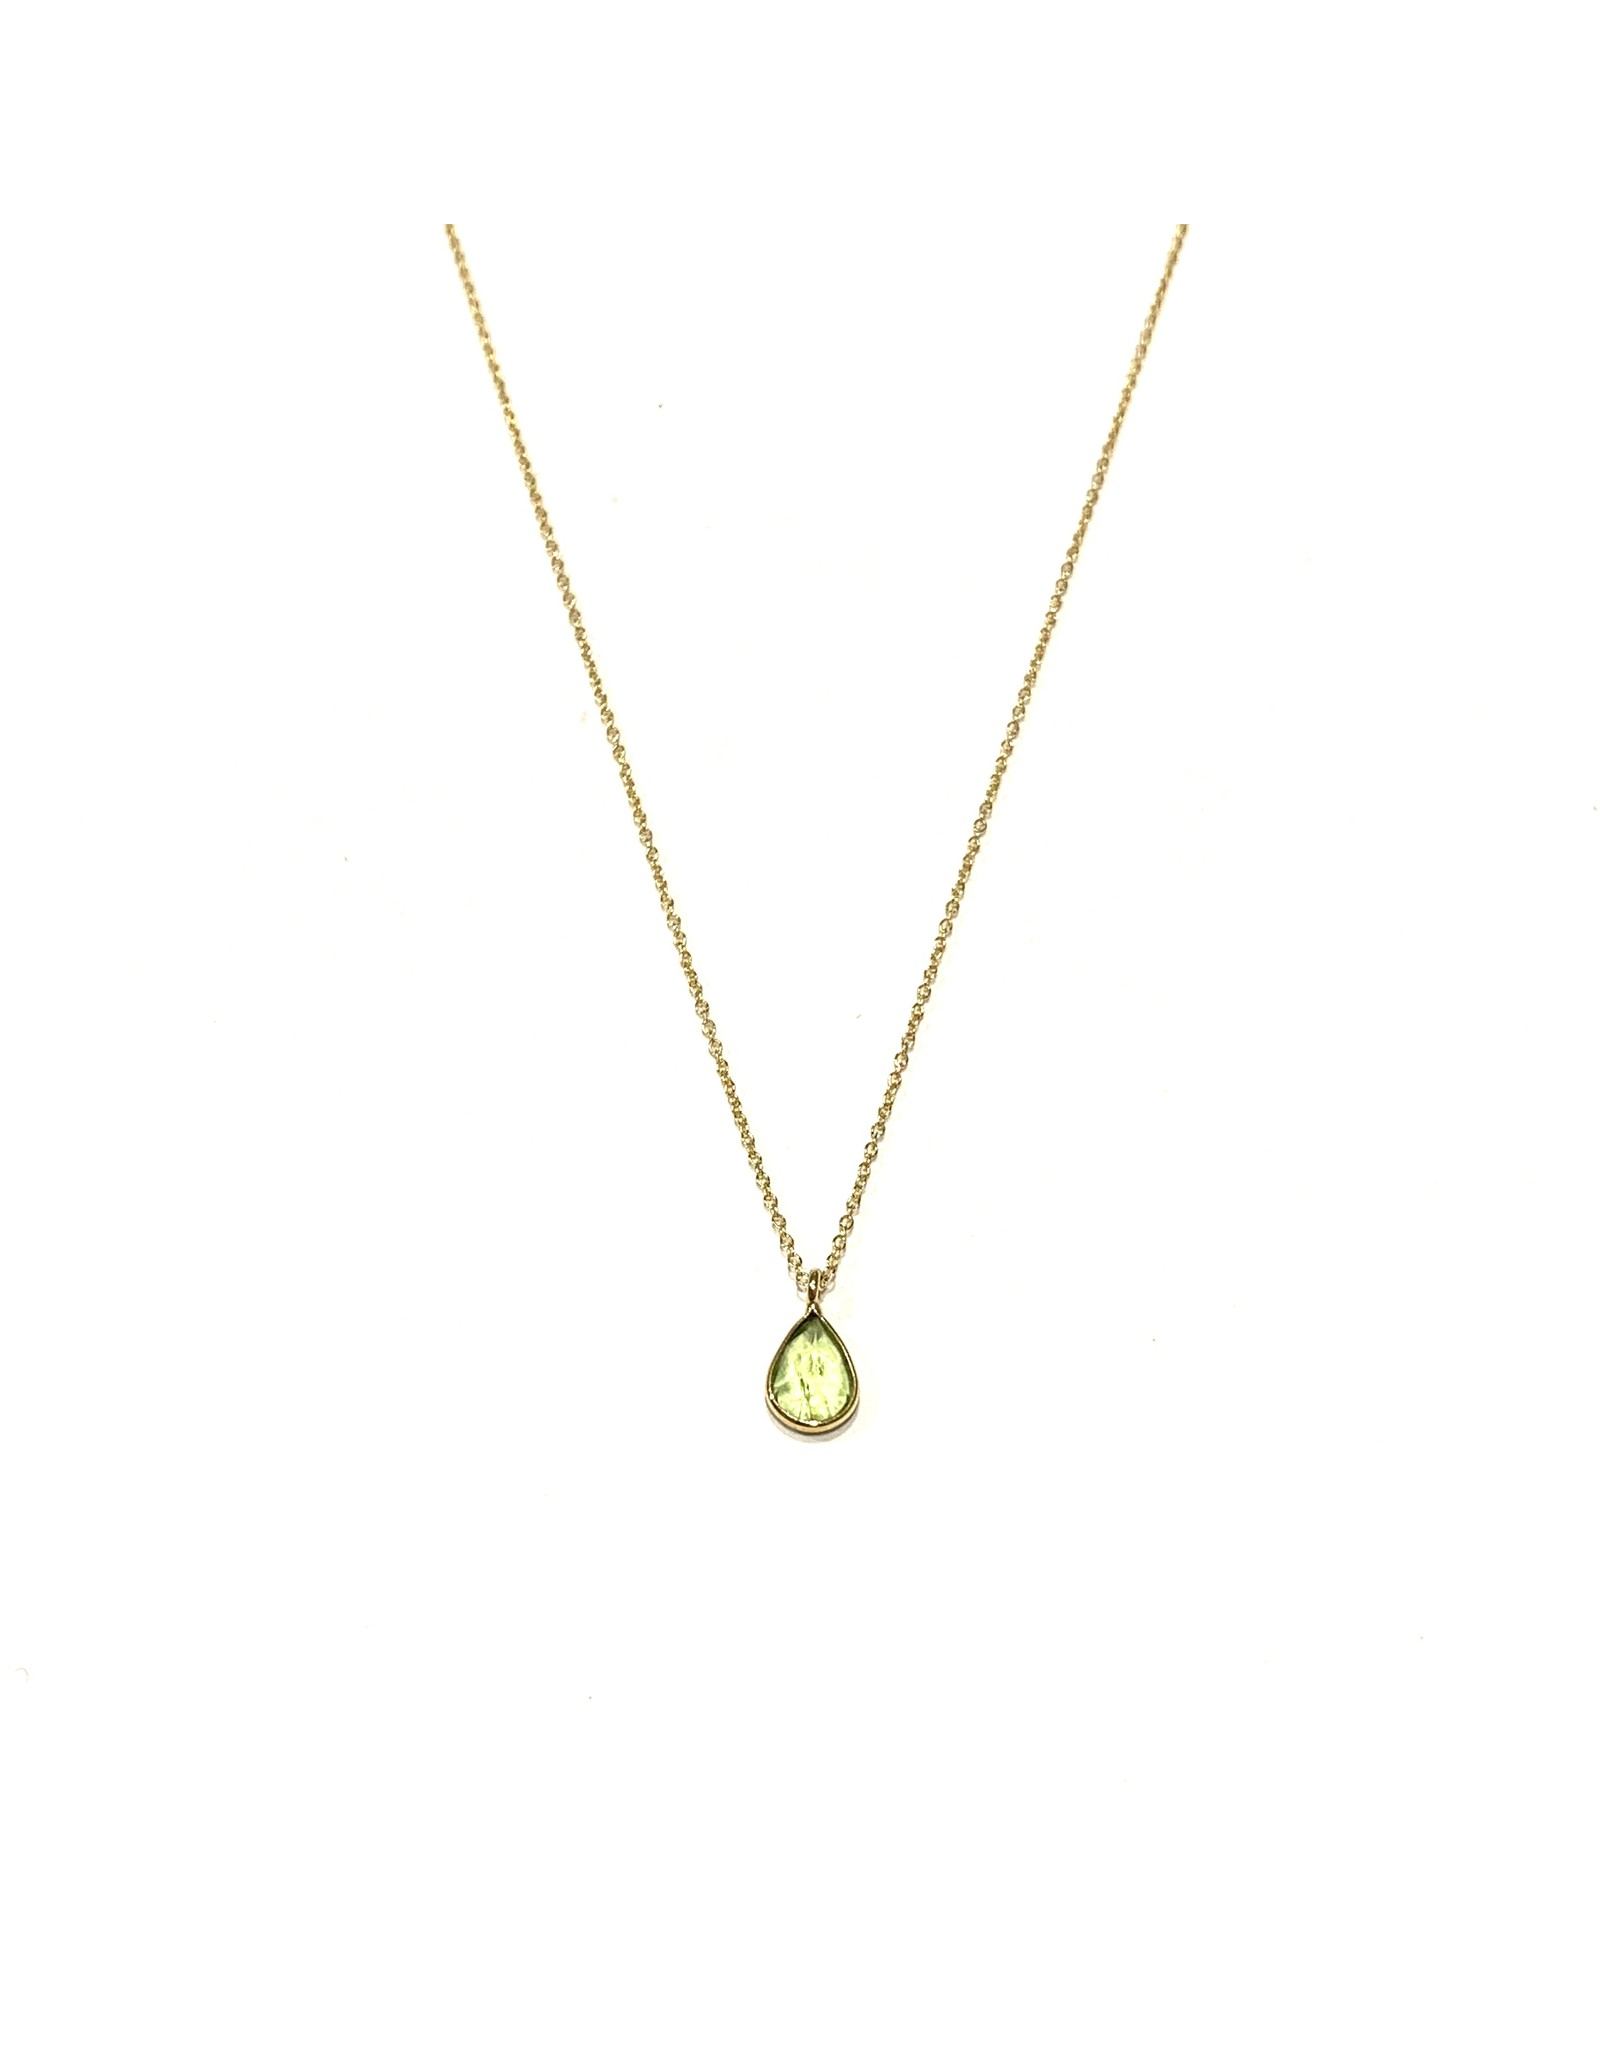 Bo Gold Necklace - Gold - Peridot